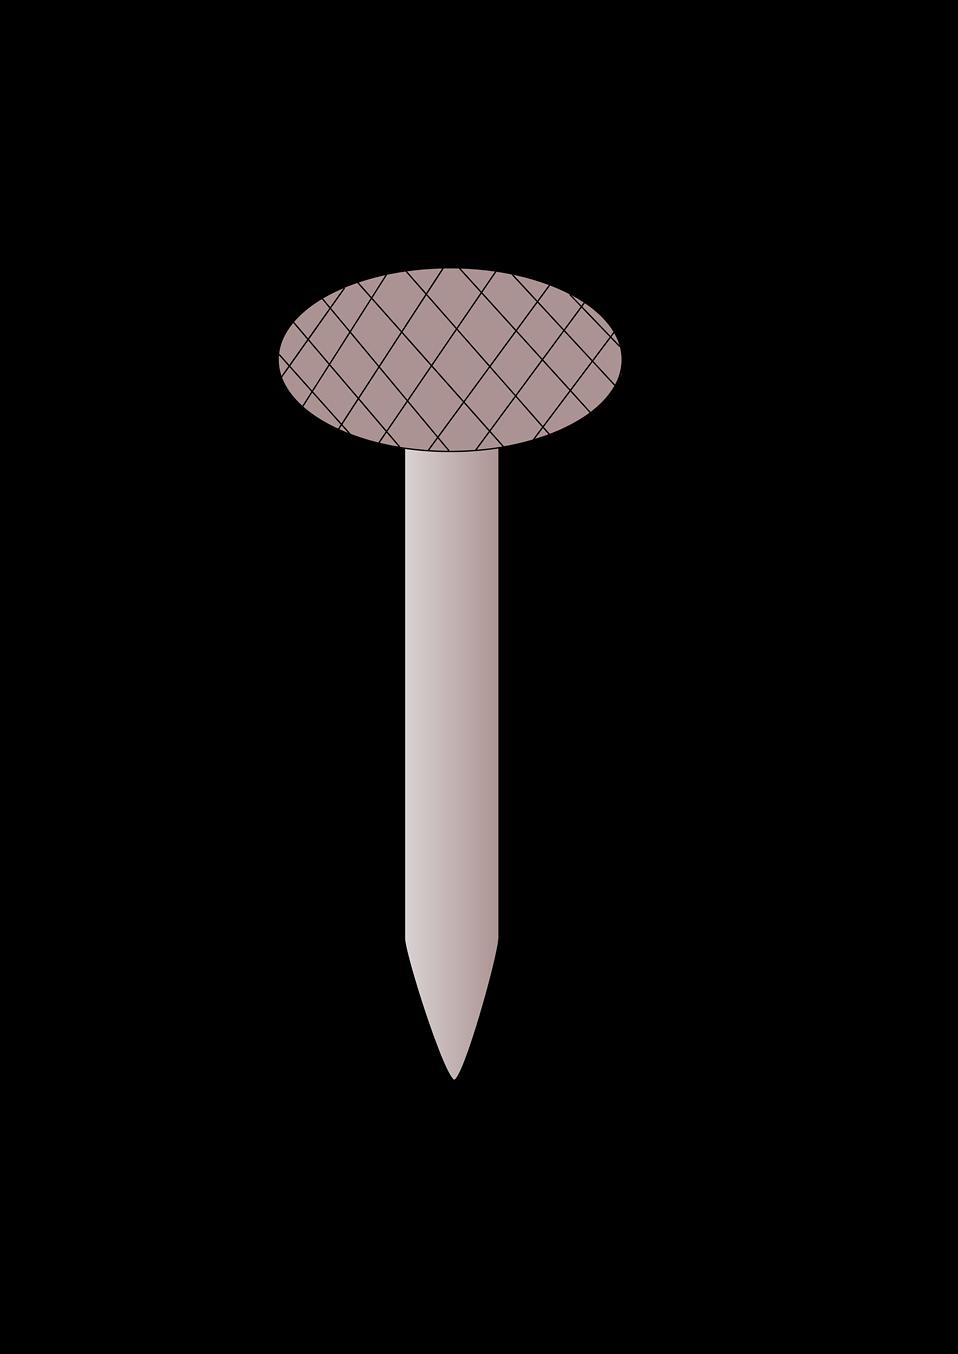 Free stock photo illustration. Nails clipart nail screw